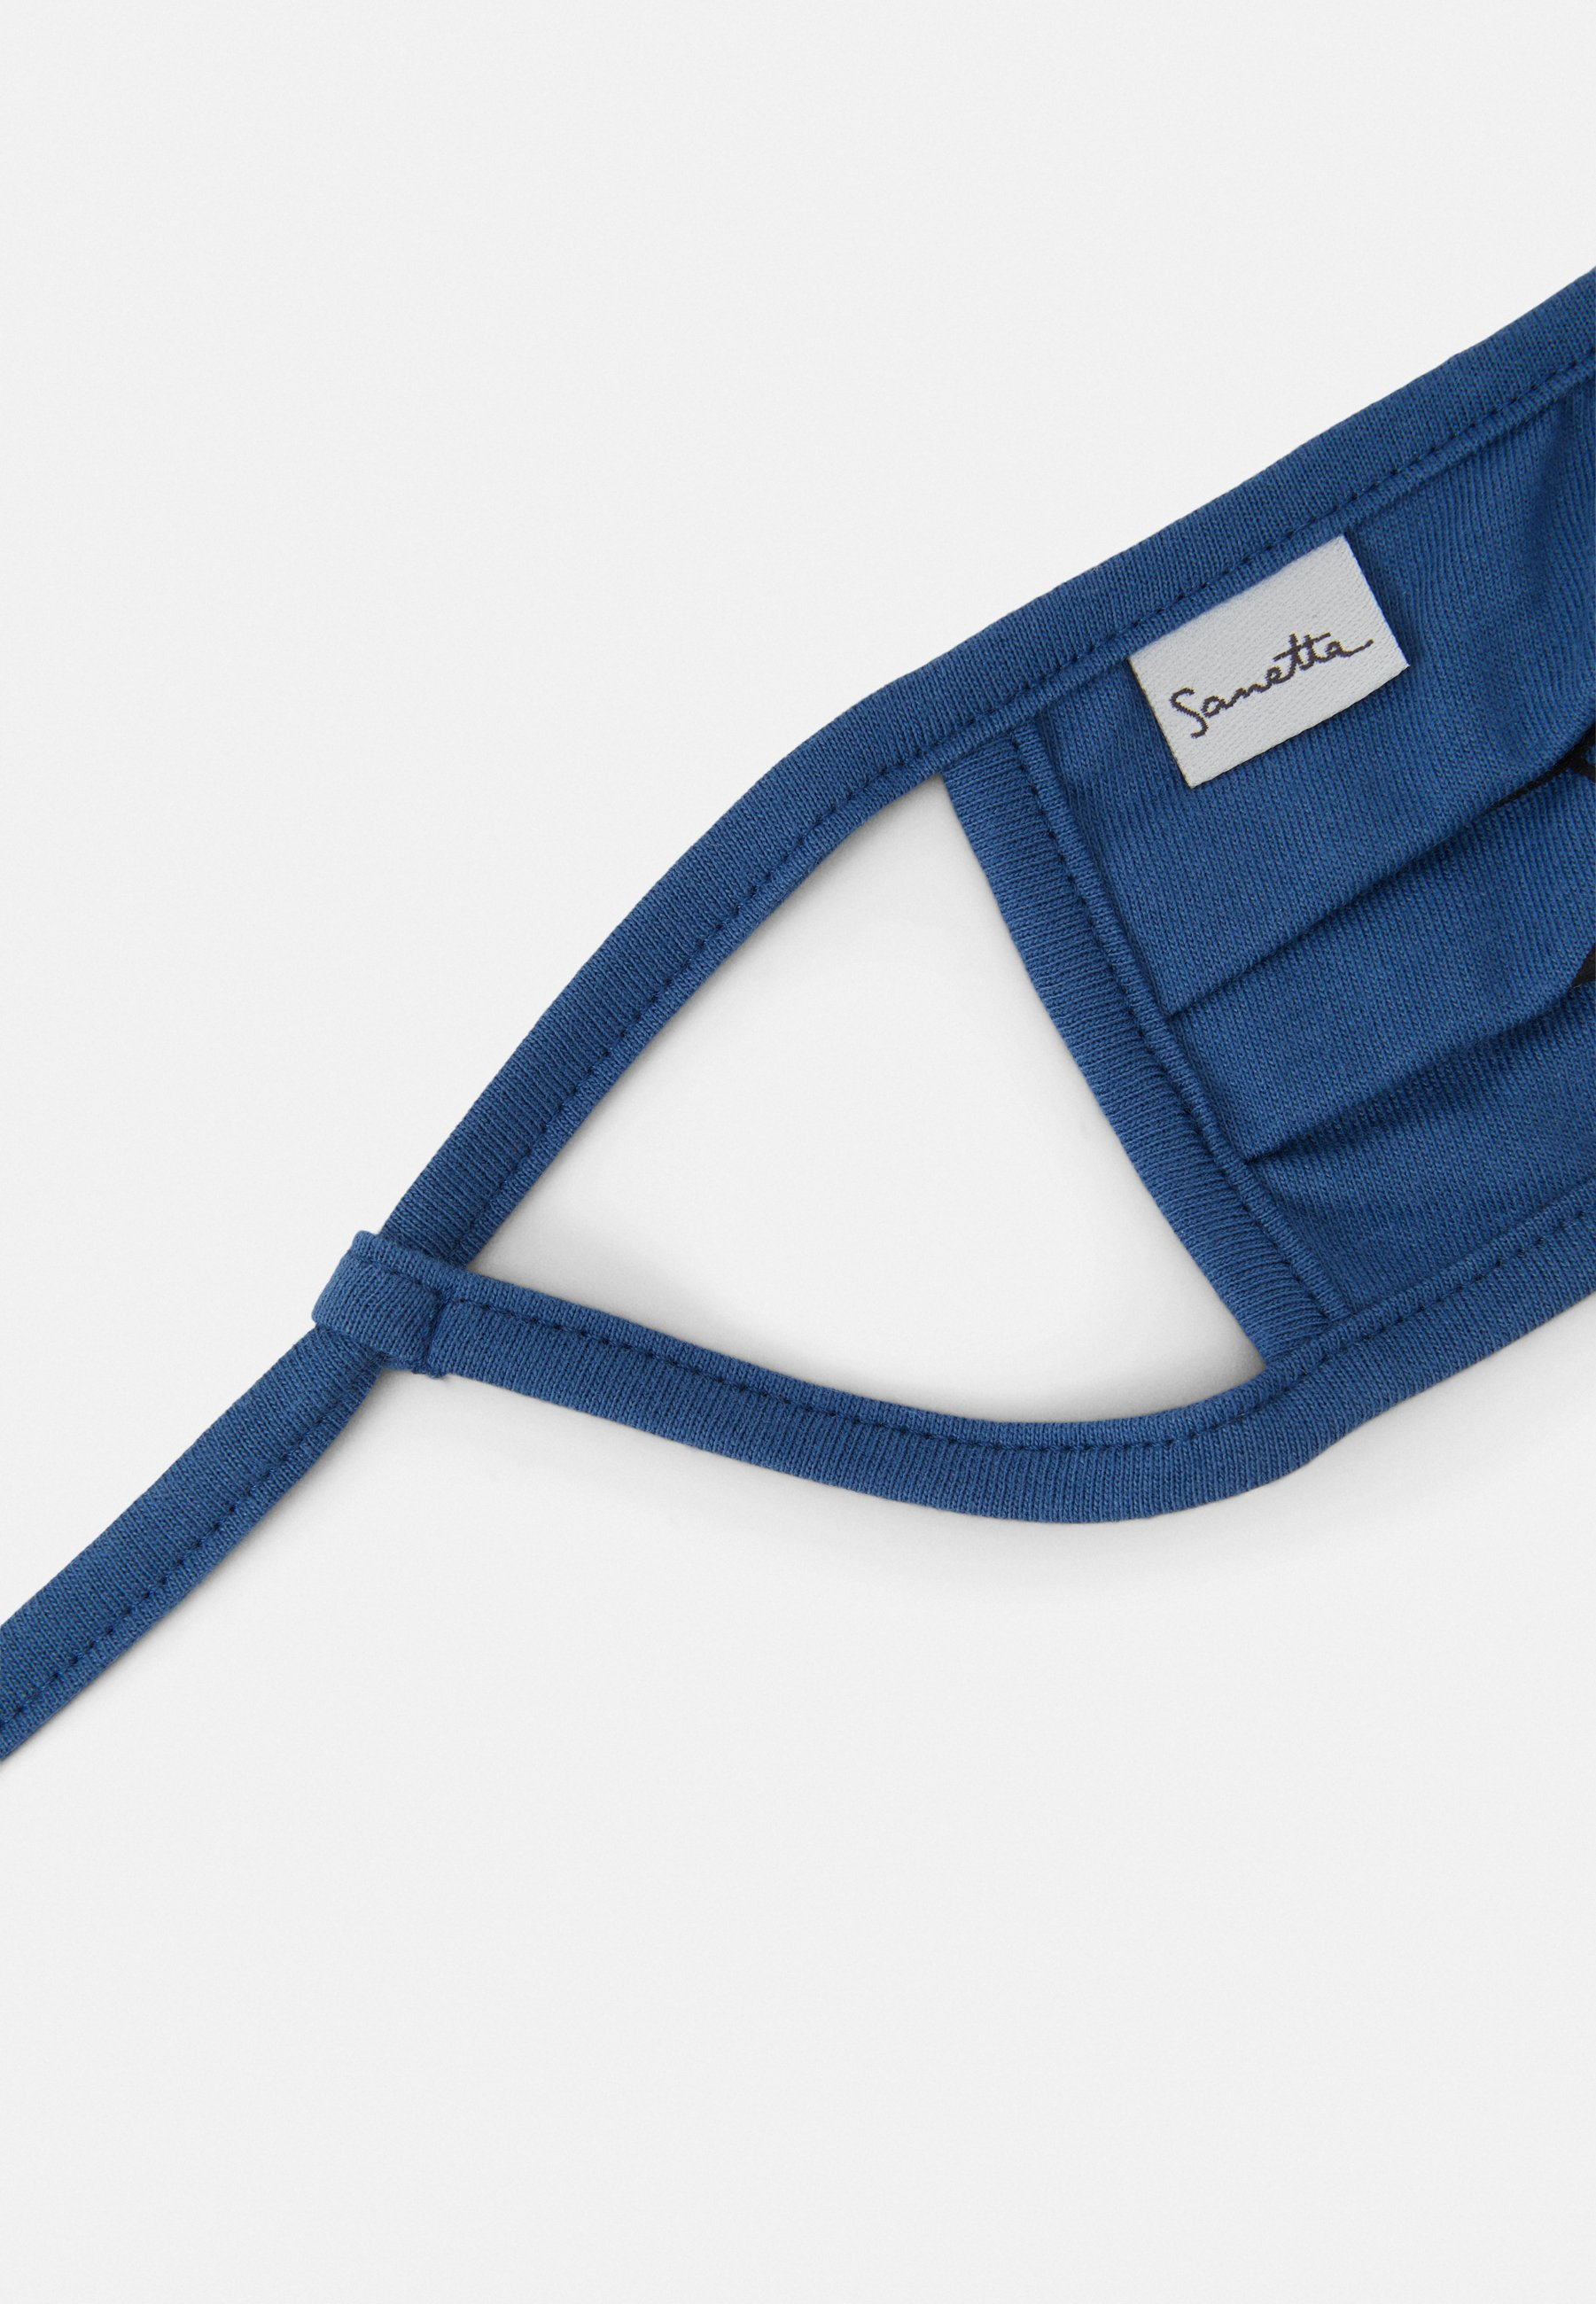 Sanetta FACEMASK 2 PACK - Munnbind i tøy - dark blue/mørkeblå 9uSIZaY0HfIvI9W